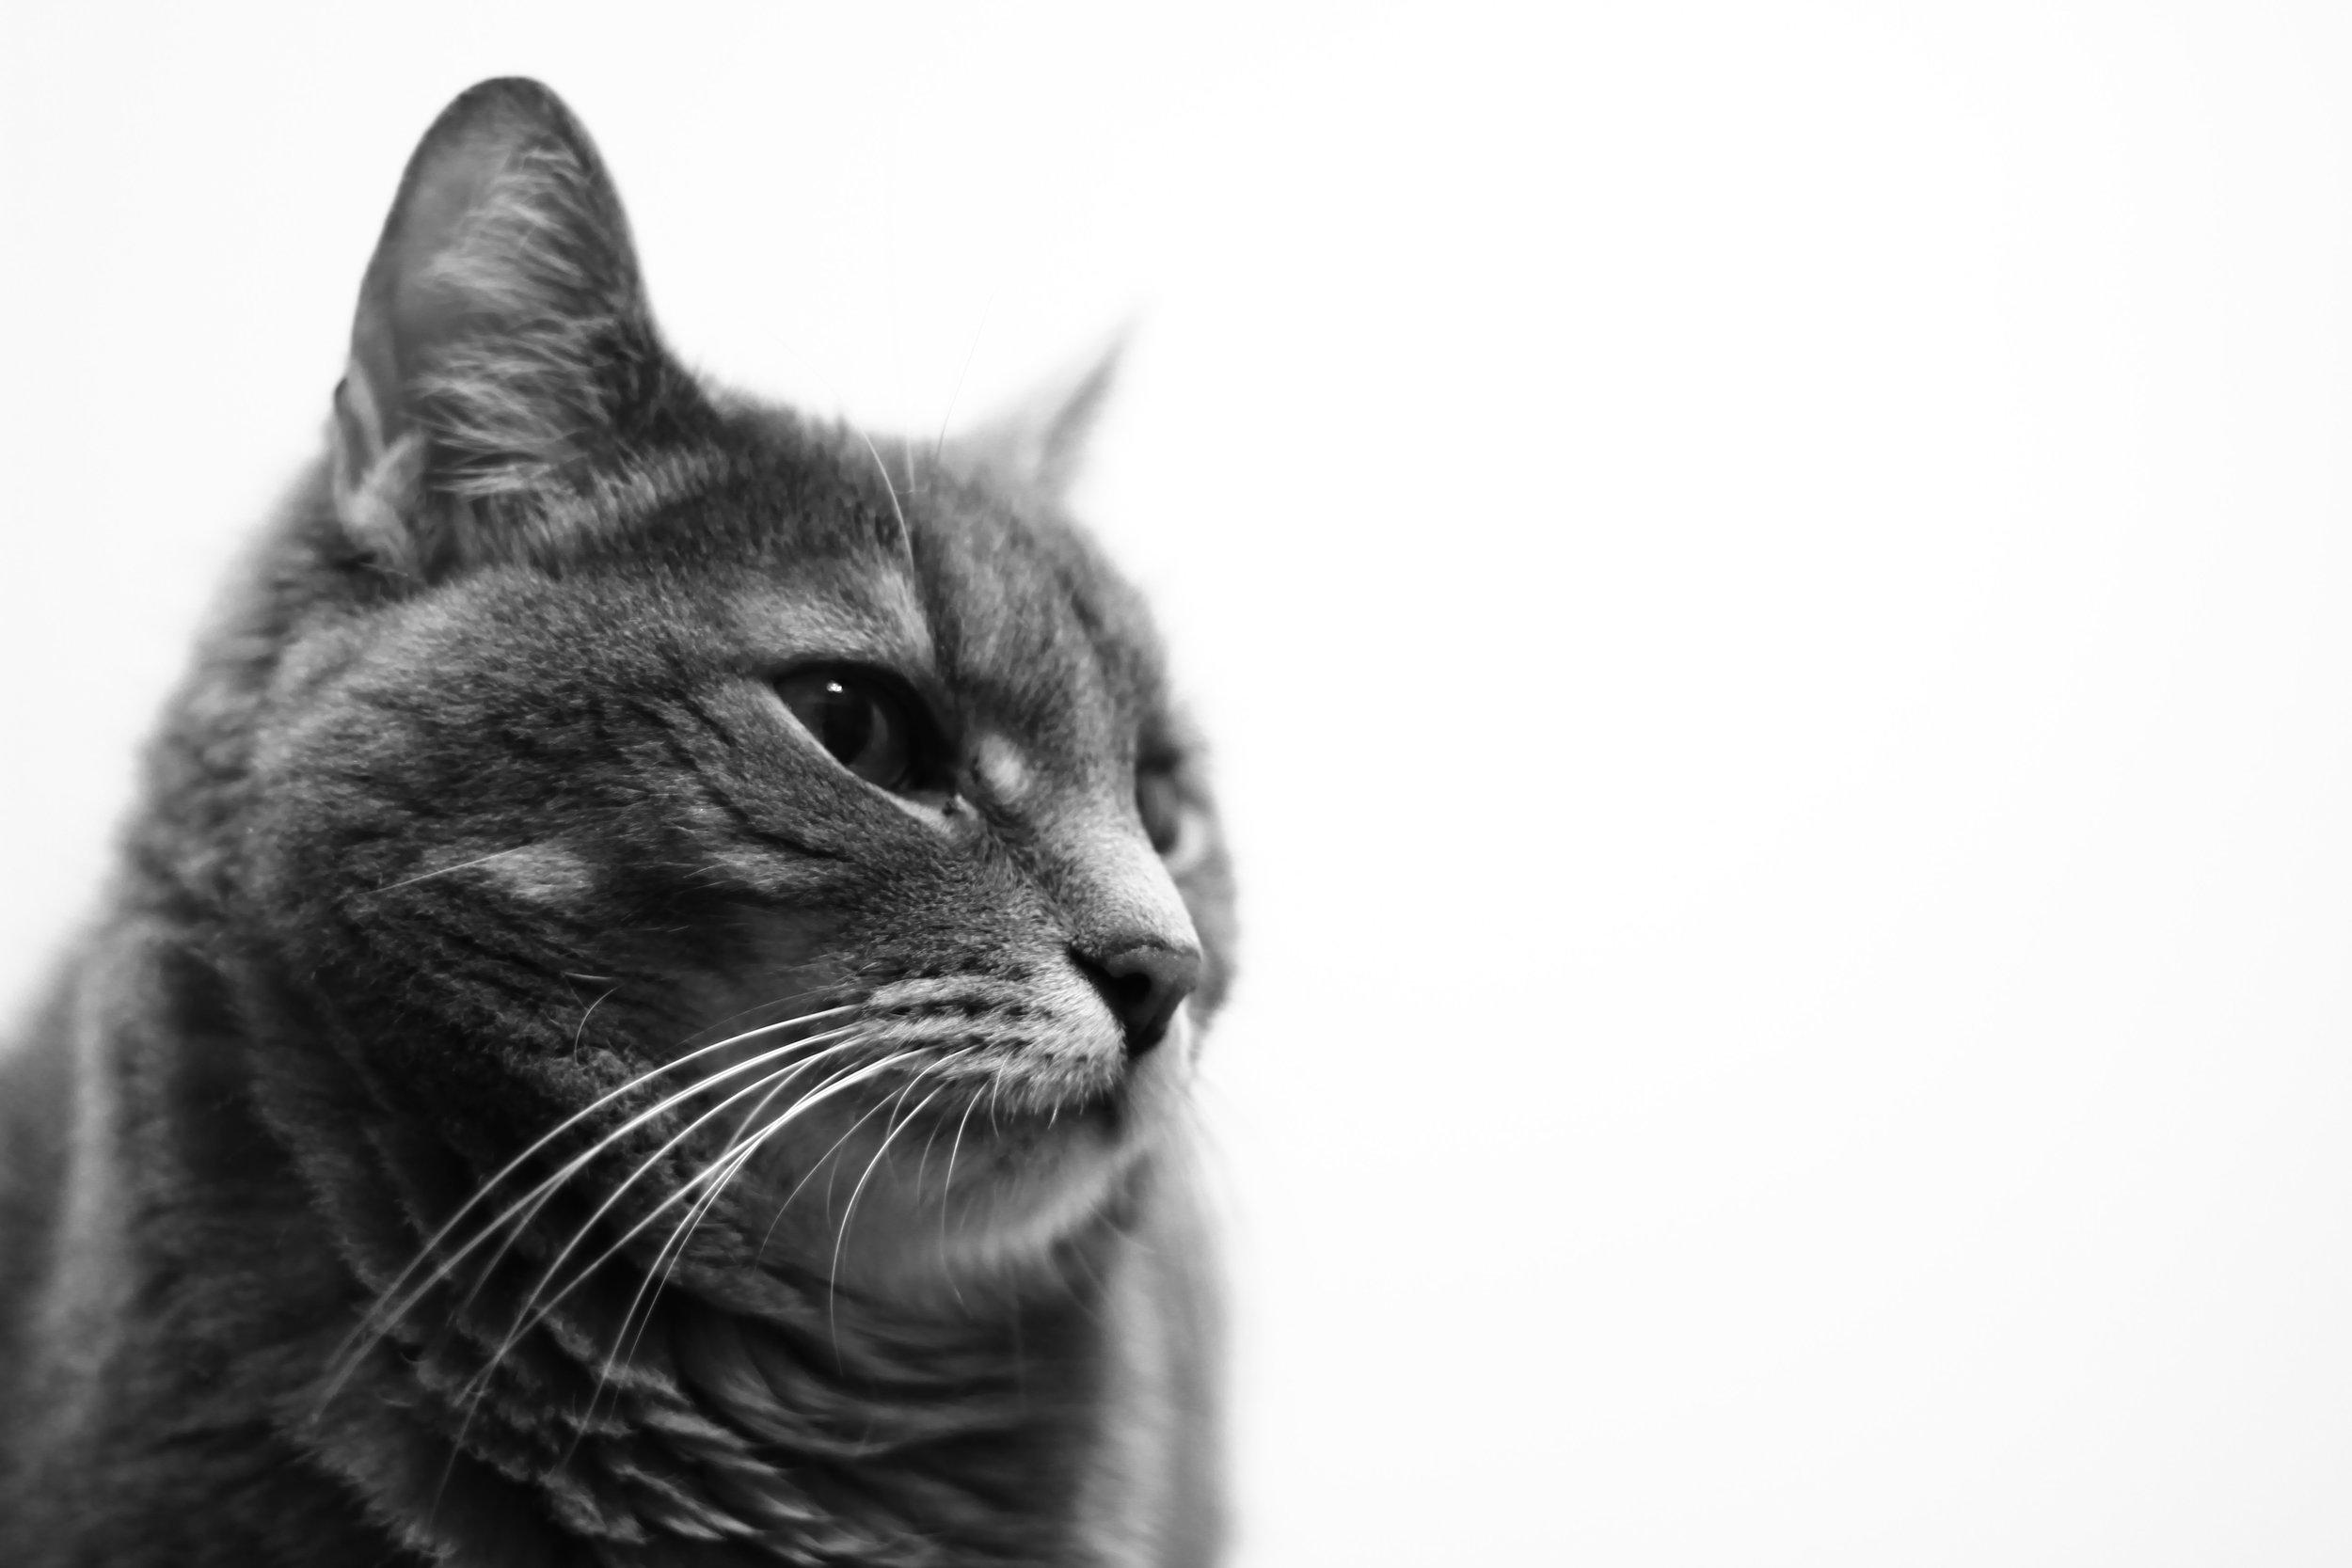 animal-black-and-white-cat-21297.jpg